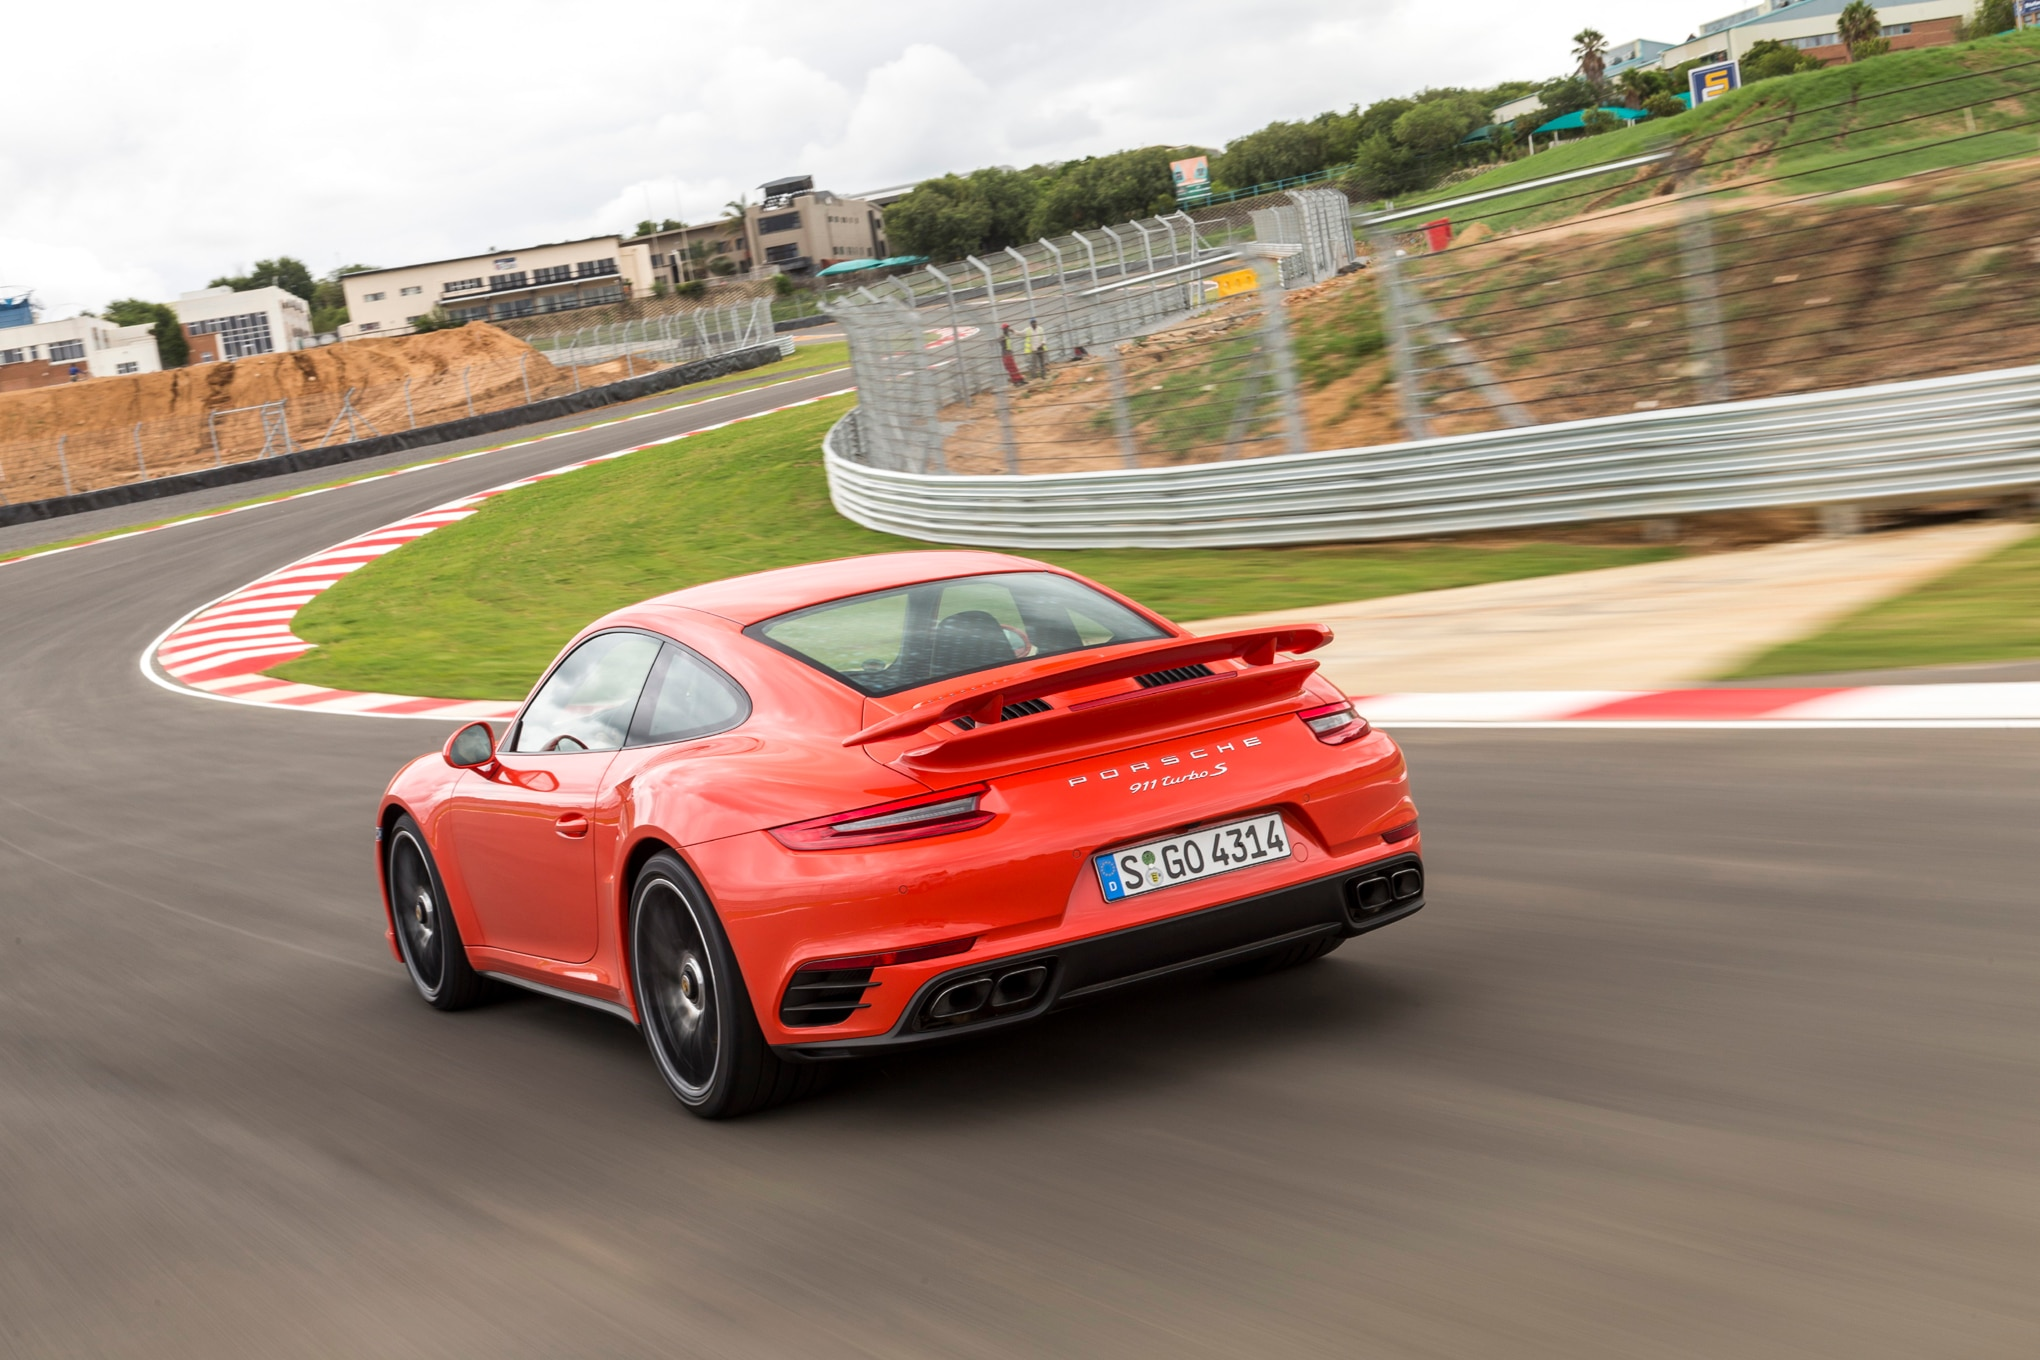 2017 Porsche 911 Turbo S rear three quarter in motion